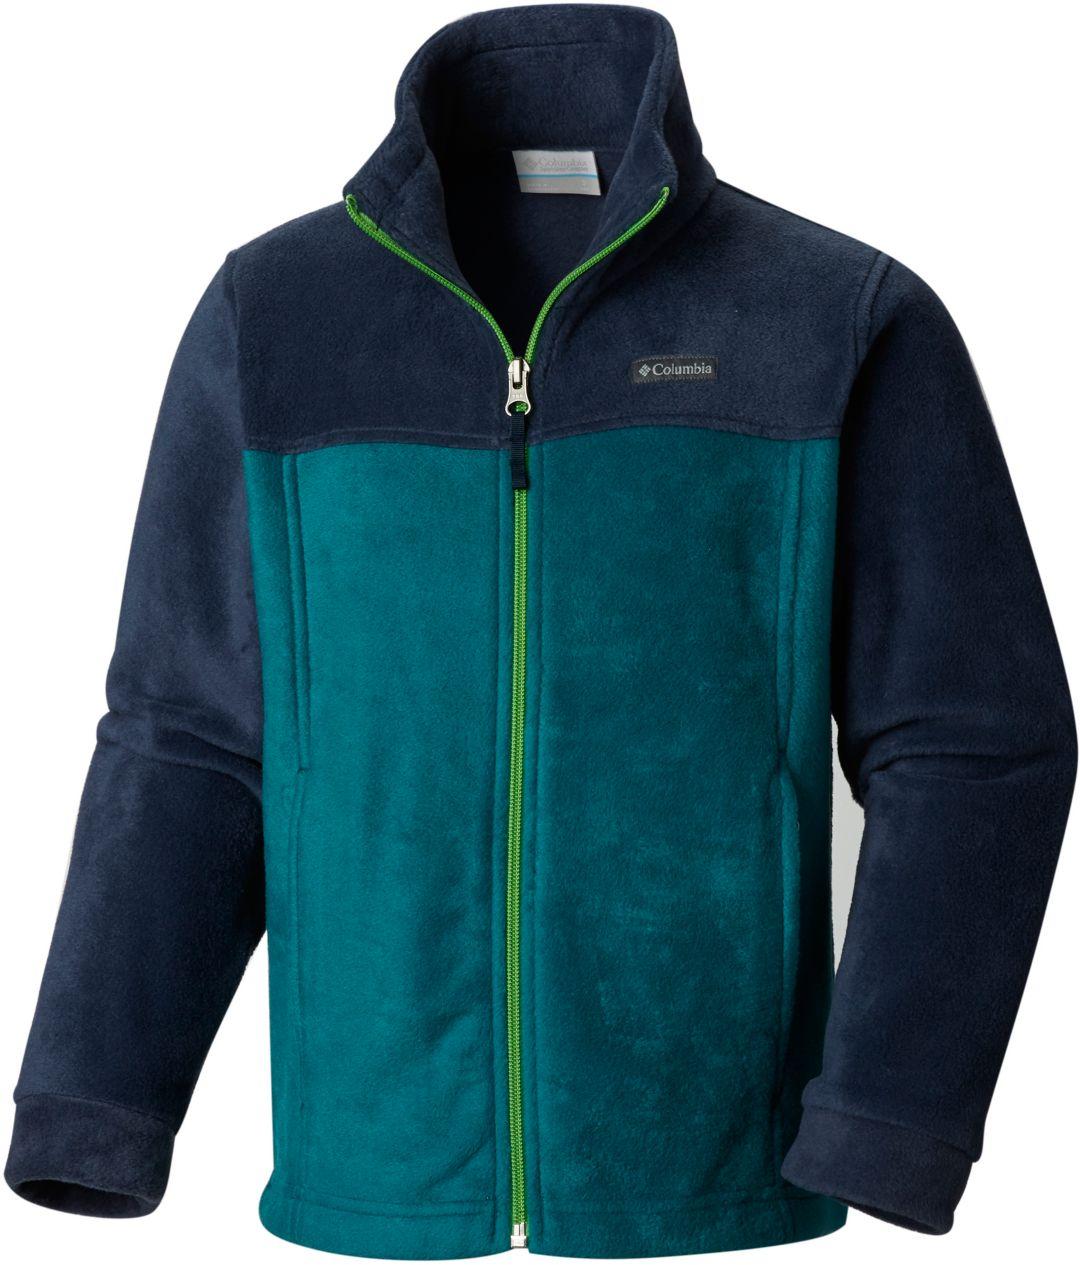 804d780fb Columbia Boys' Steens Mountain Fleece Jacket | DICK'S Sporting Goods